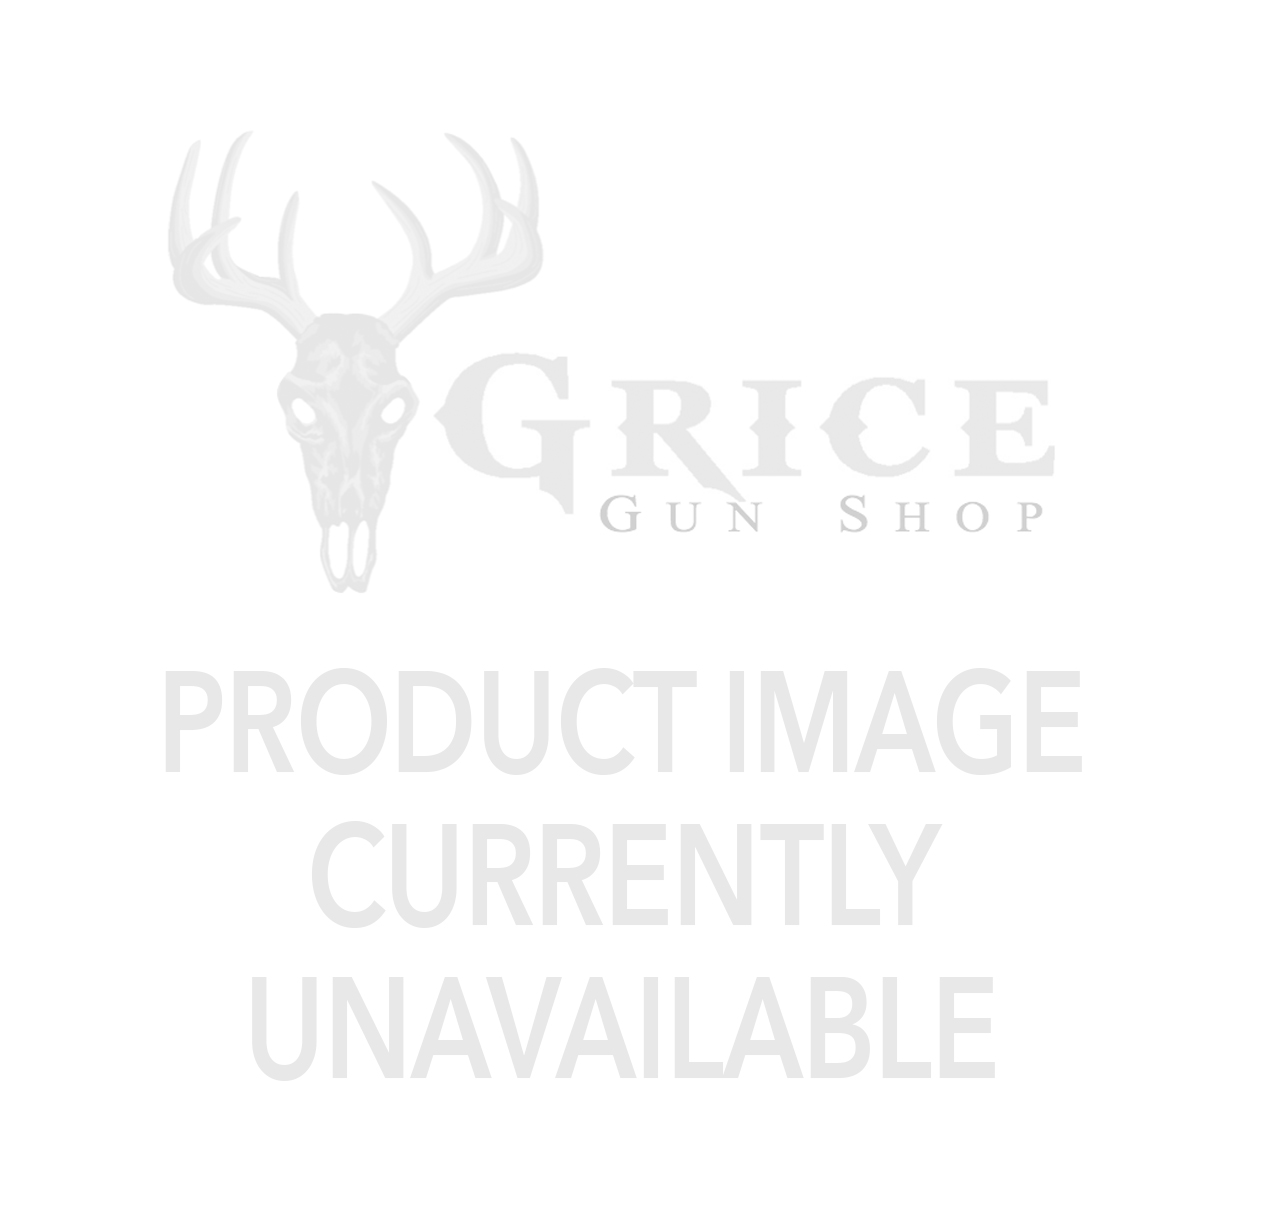 Burris - Handgun 2-7x32mm Plex Reticle